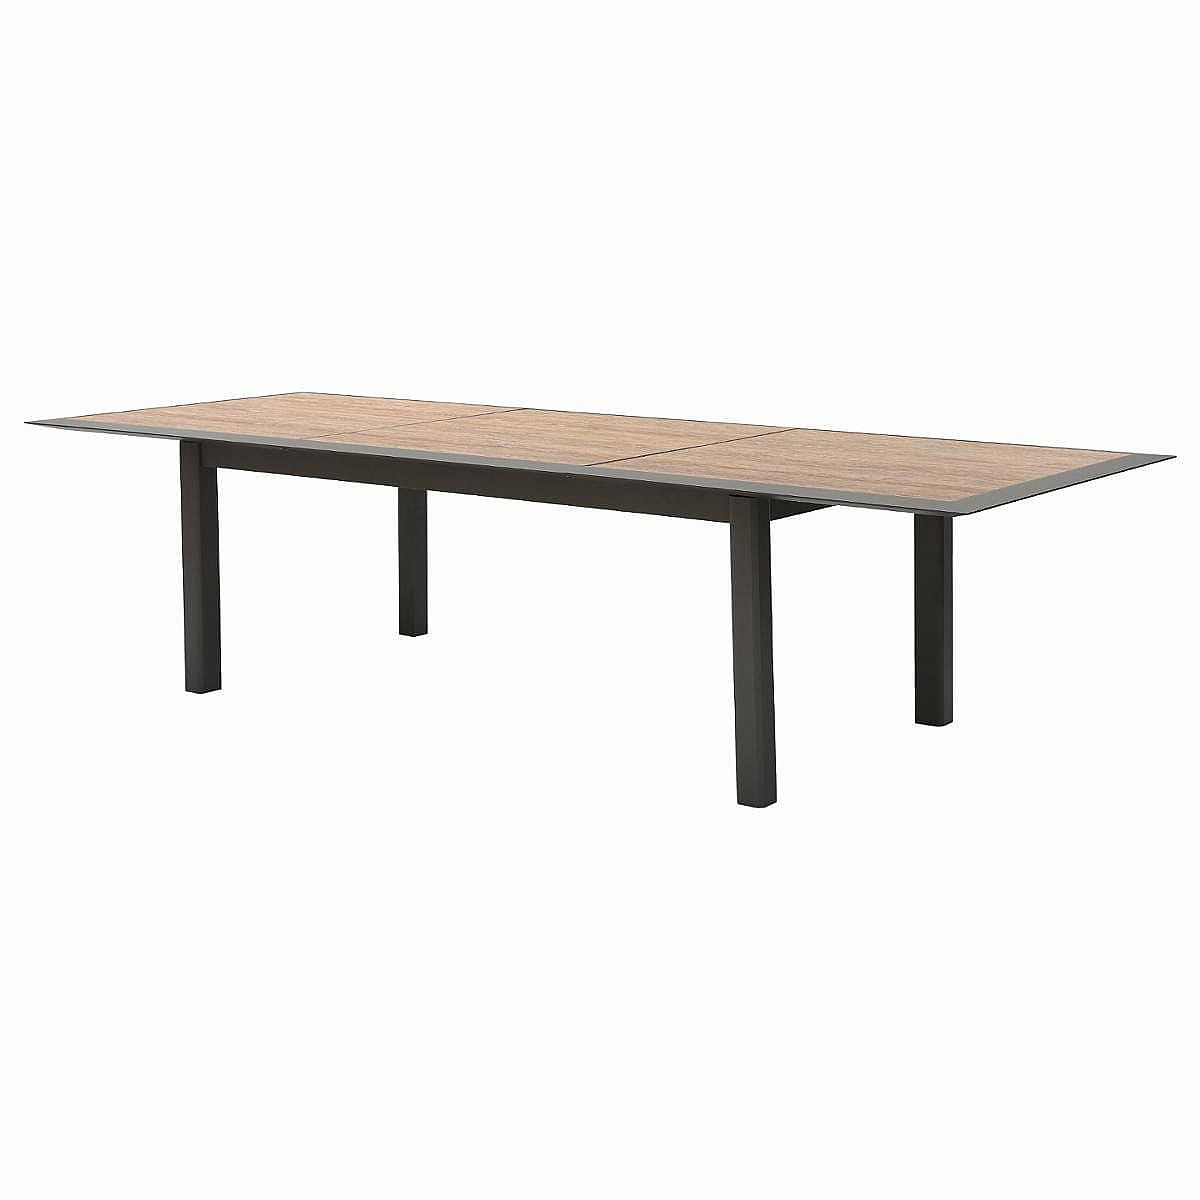 Hliníkový stůl VERMONT 216/316 cm (šedo-hnědý)